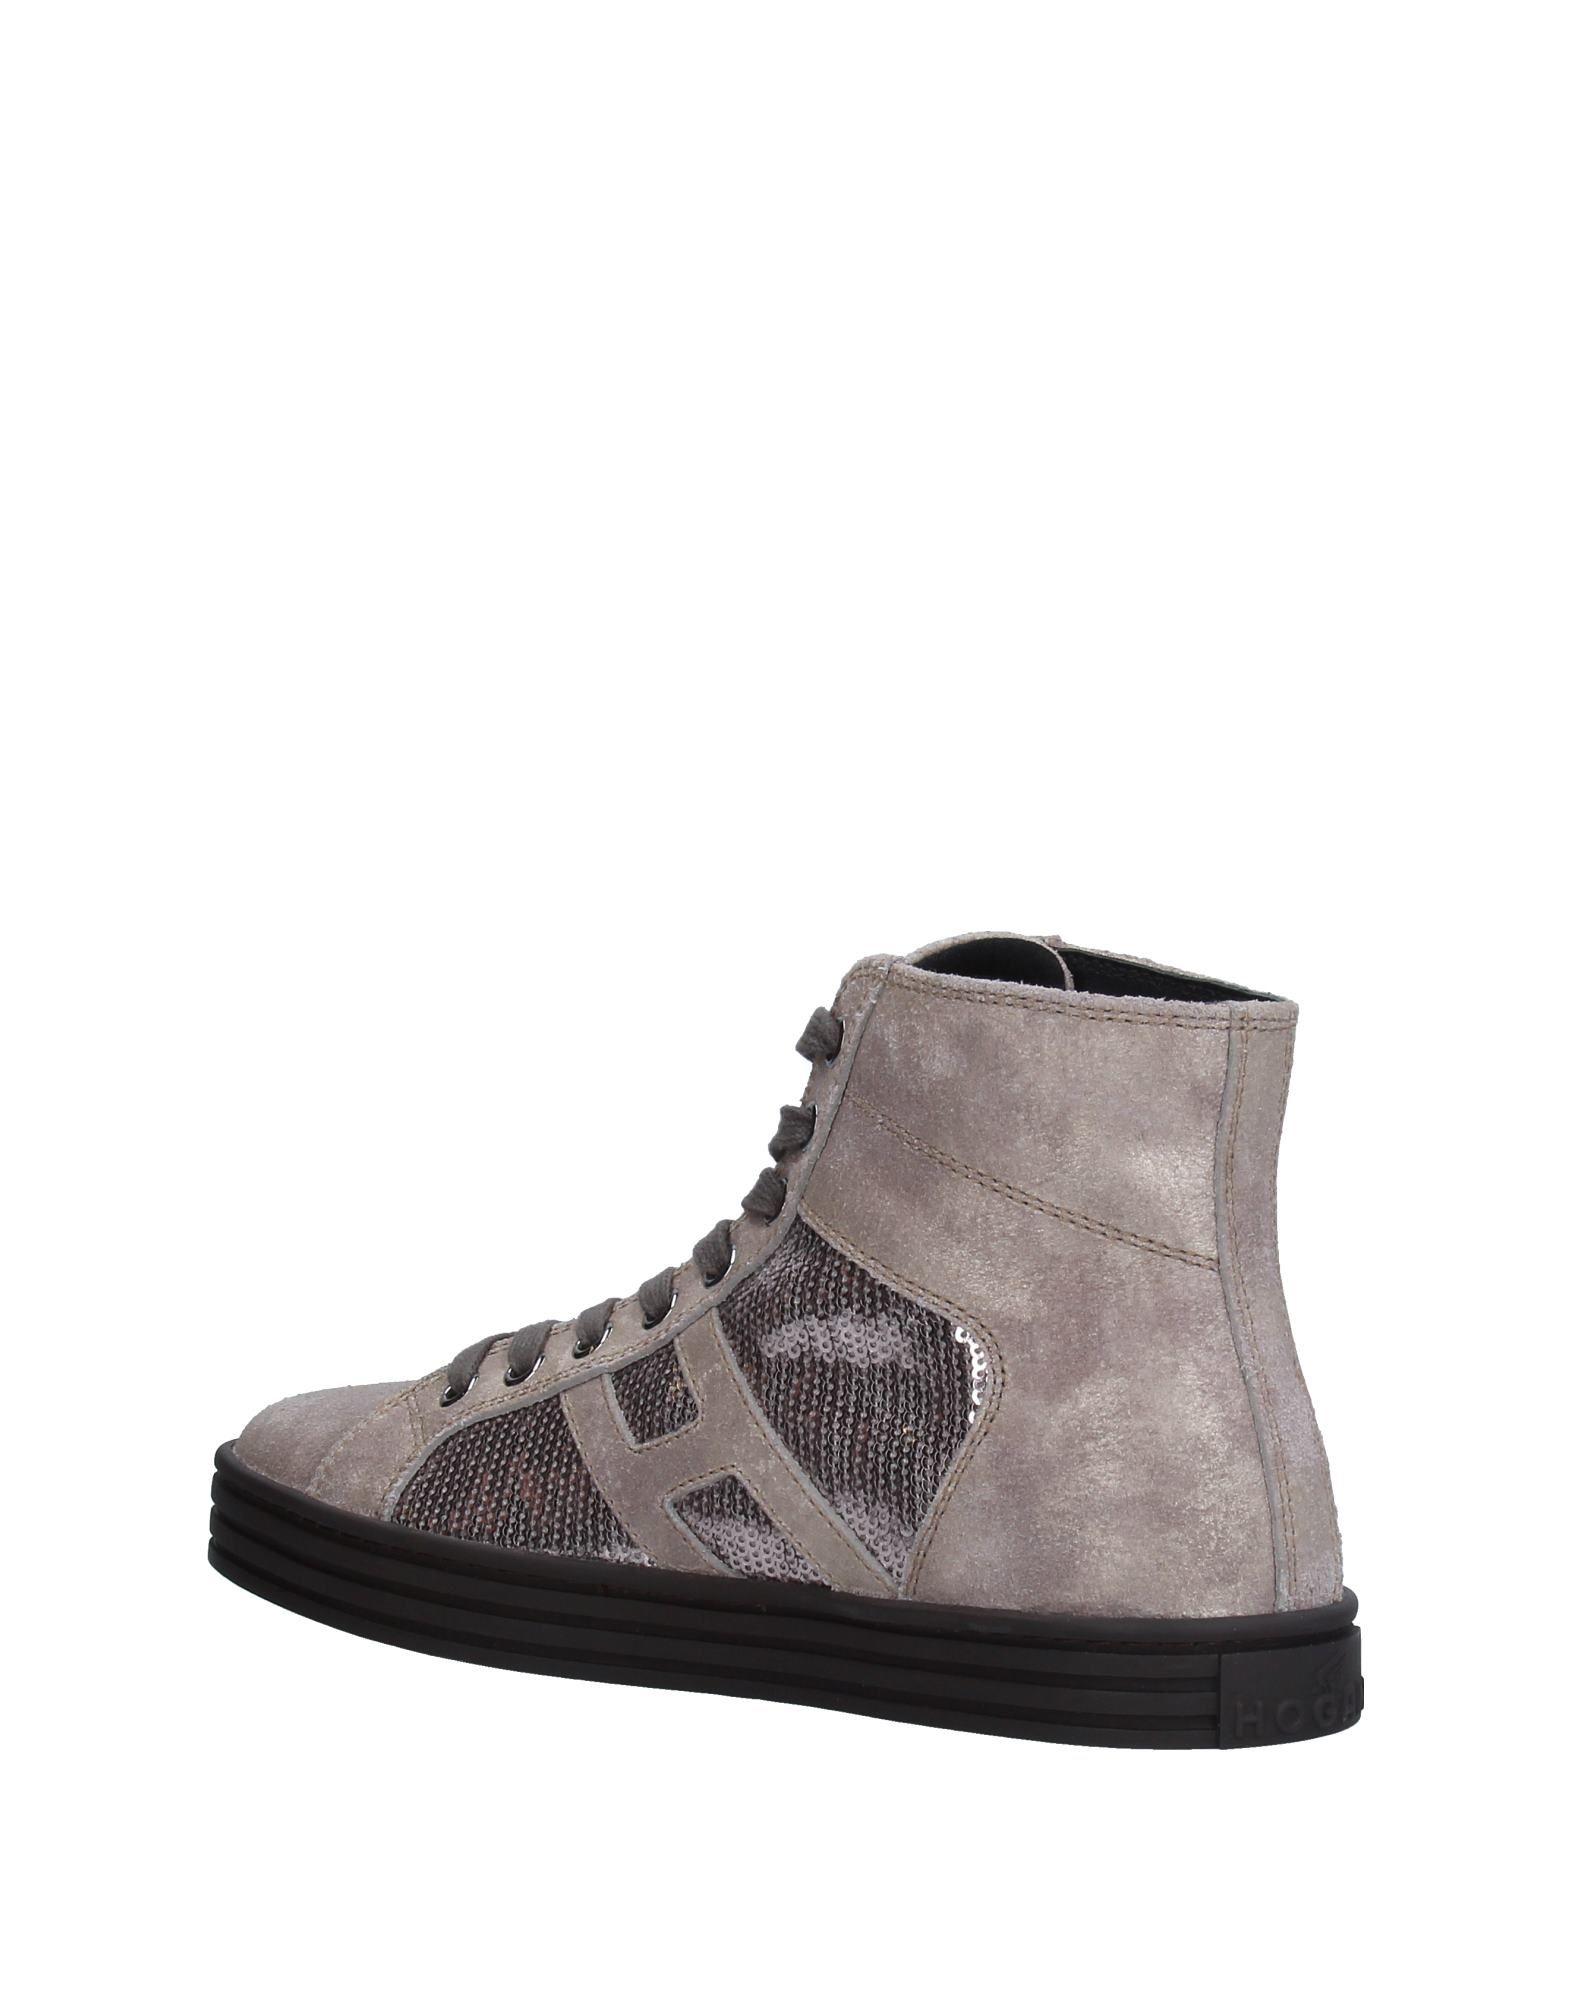 Hogan Rebel Sneakers Damen   Damen 11217941EJ Neue Schuhe 29ffc3